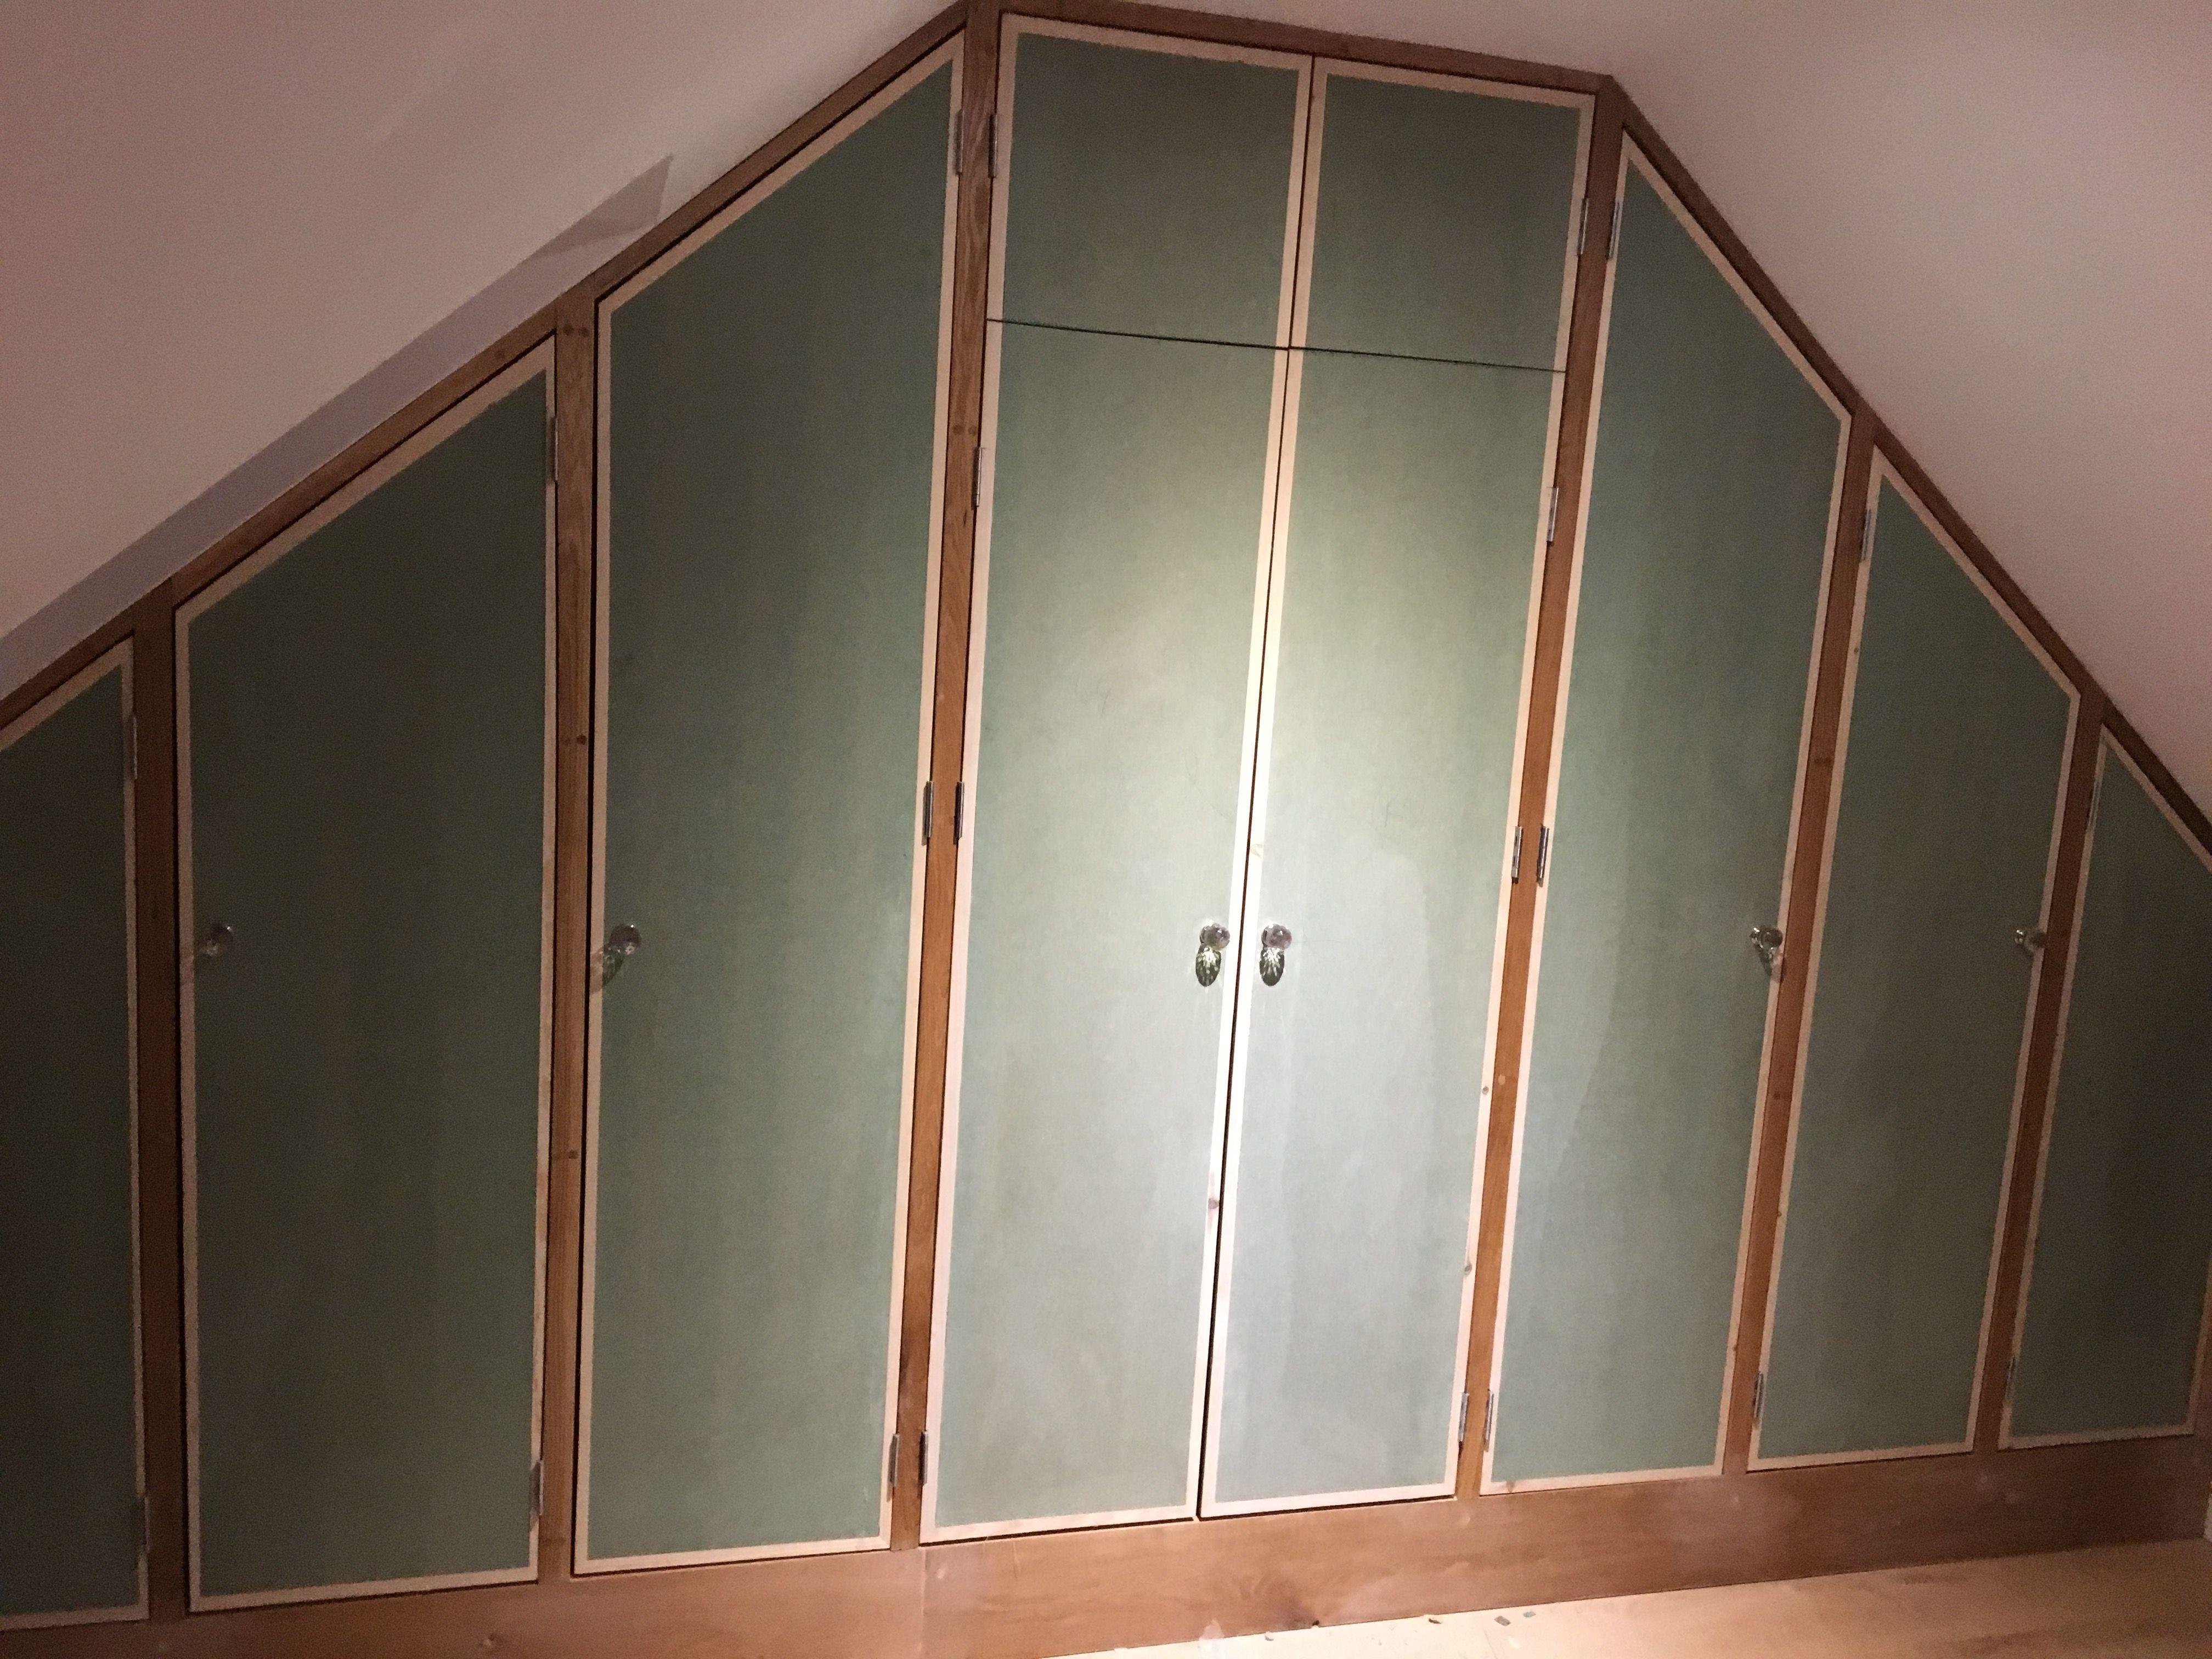 American White Oak Attic Wardrobes With Mdf Custom Doors Stair Railing Design Outdoor Stair Railing Railing Design